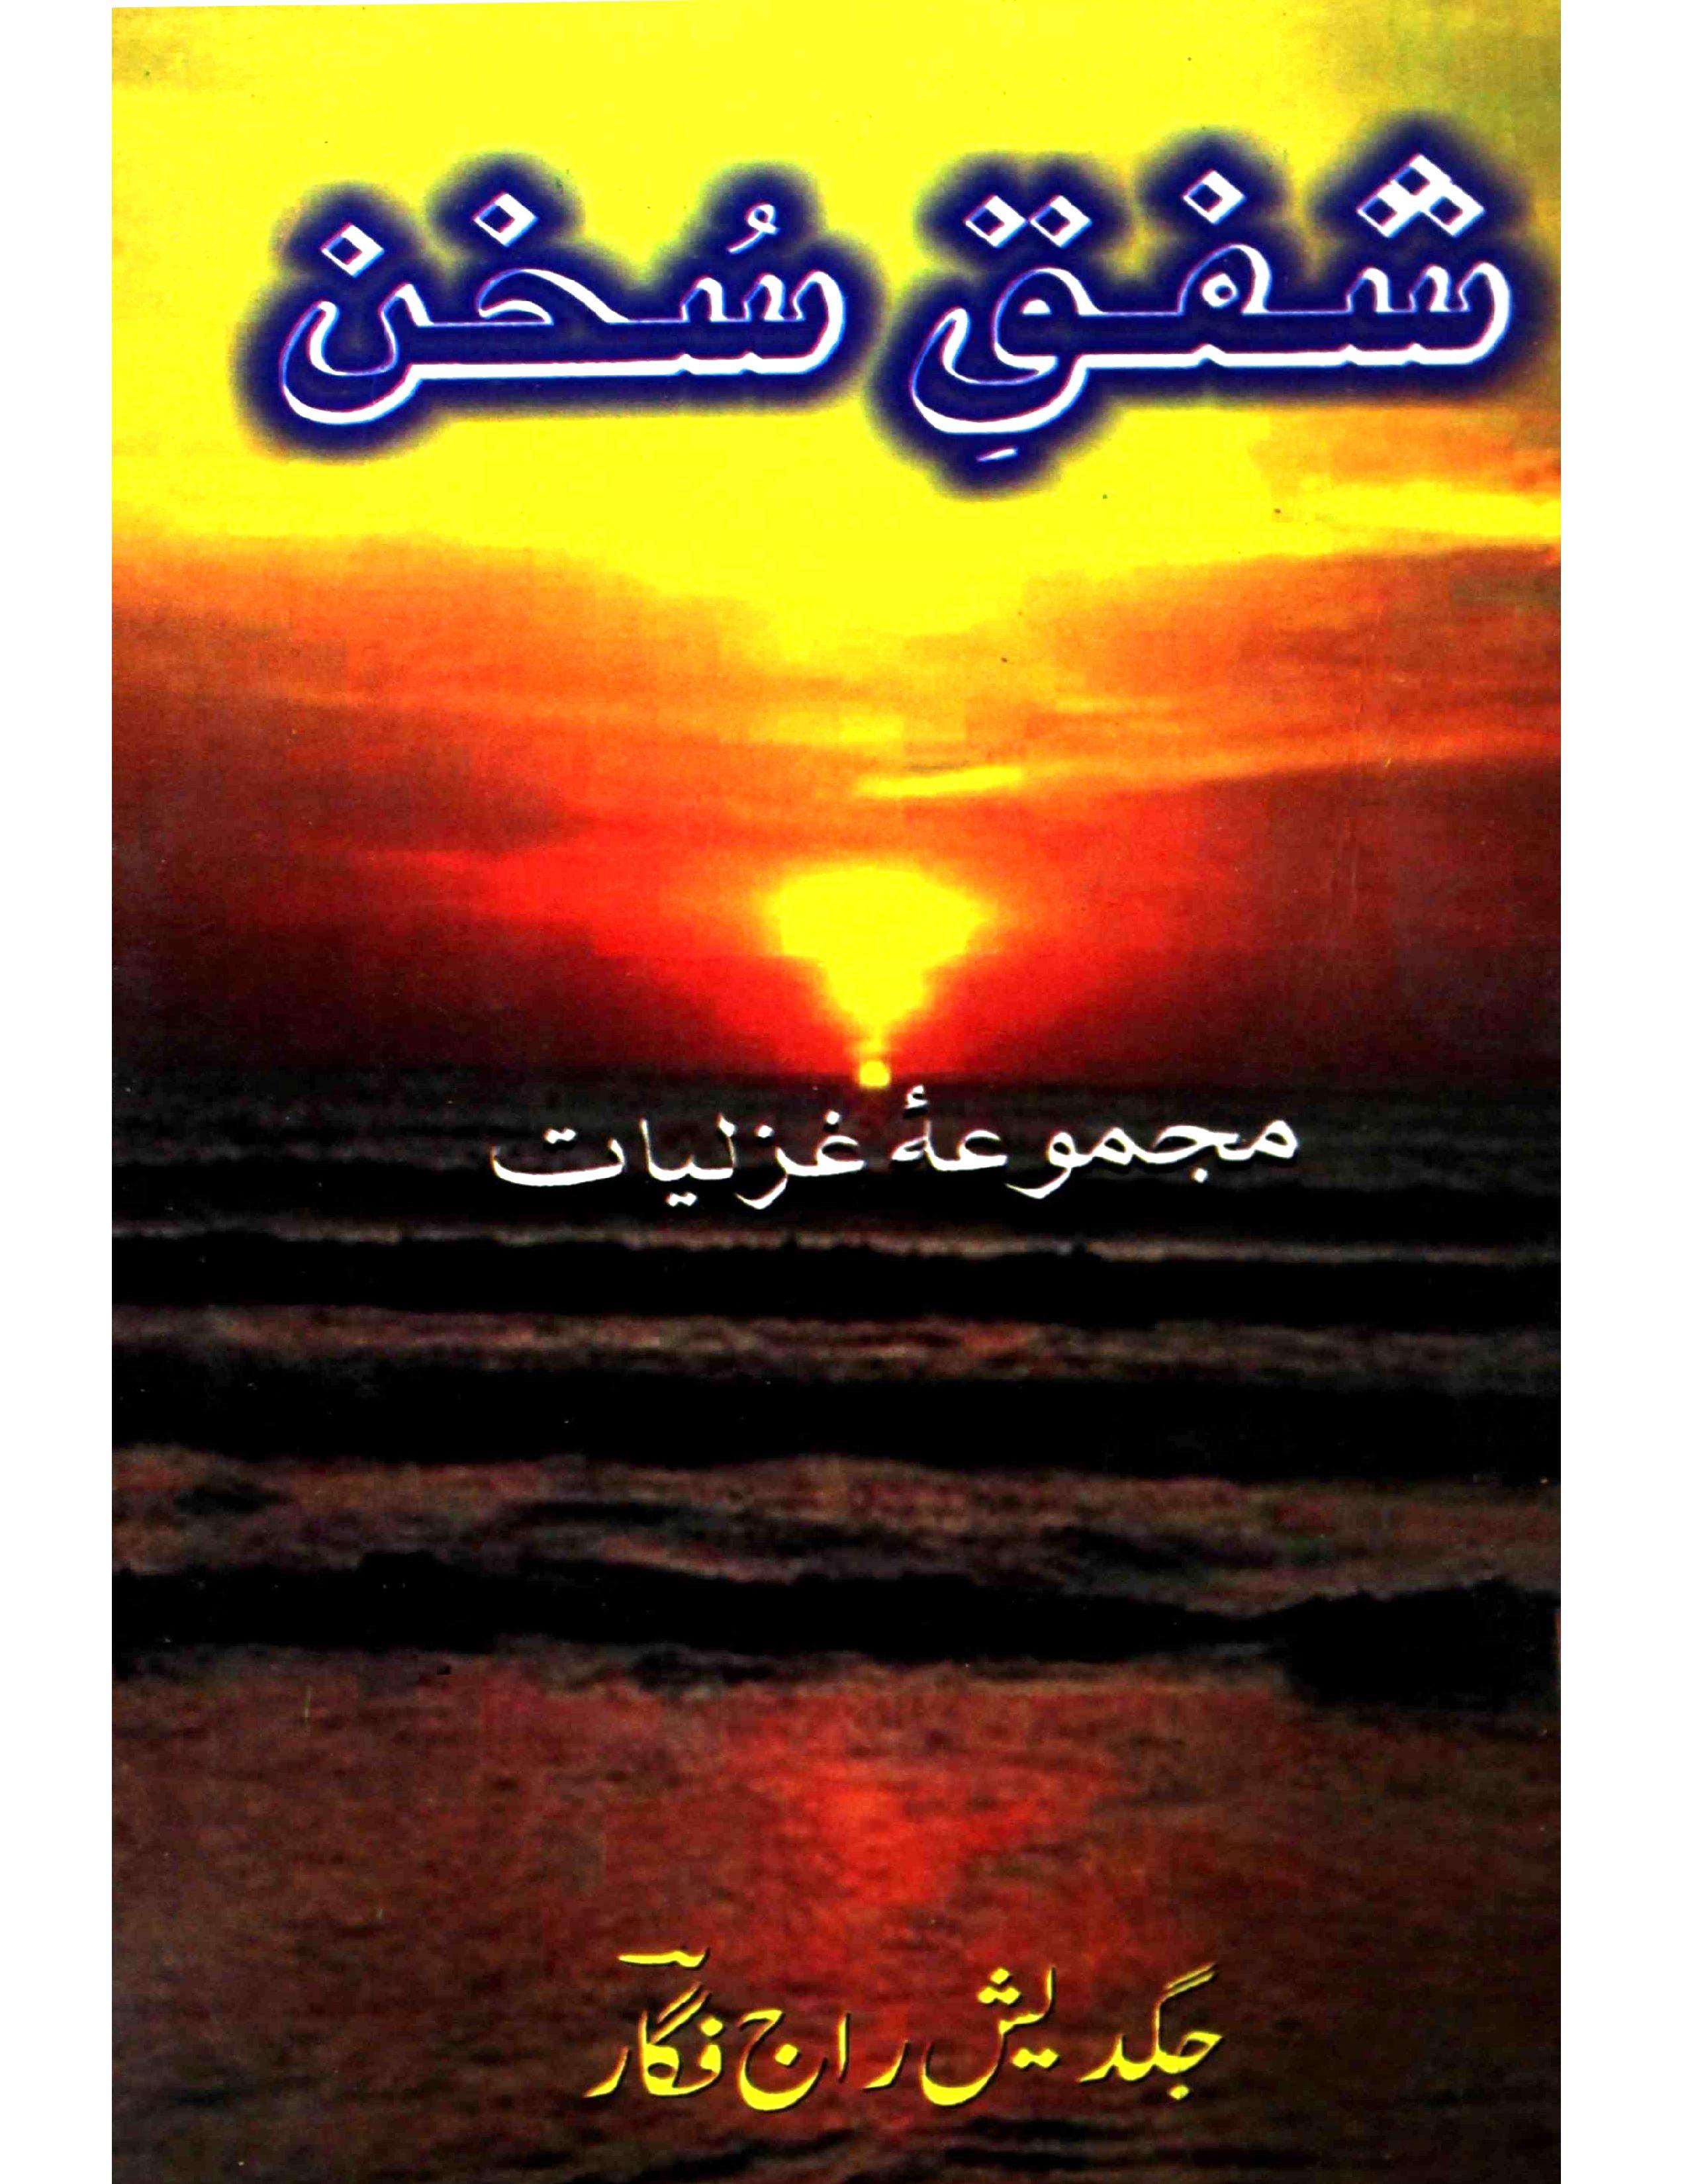 Shafaq-e-Sukhan